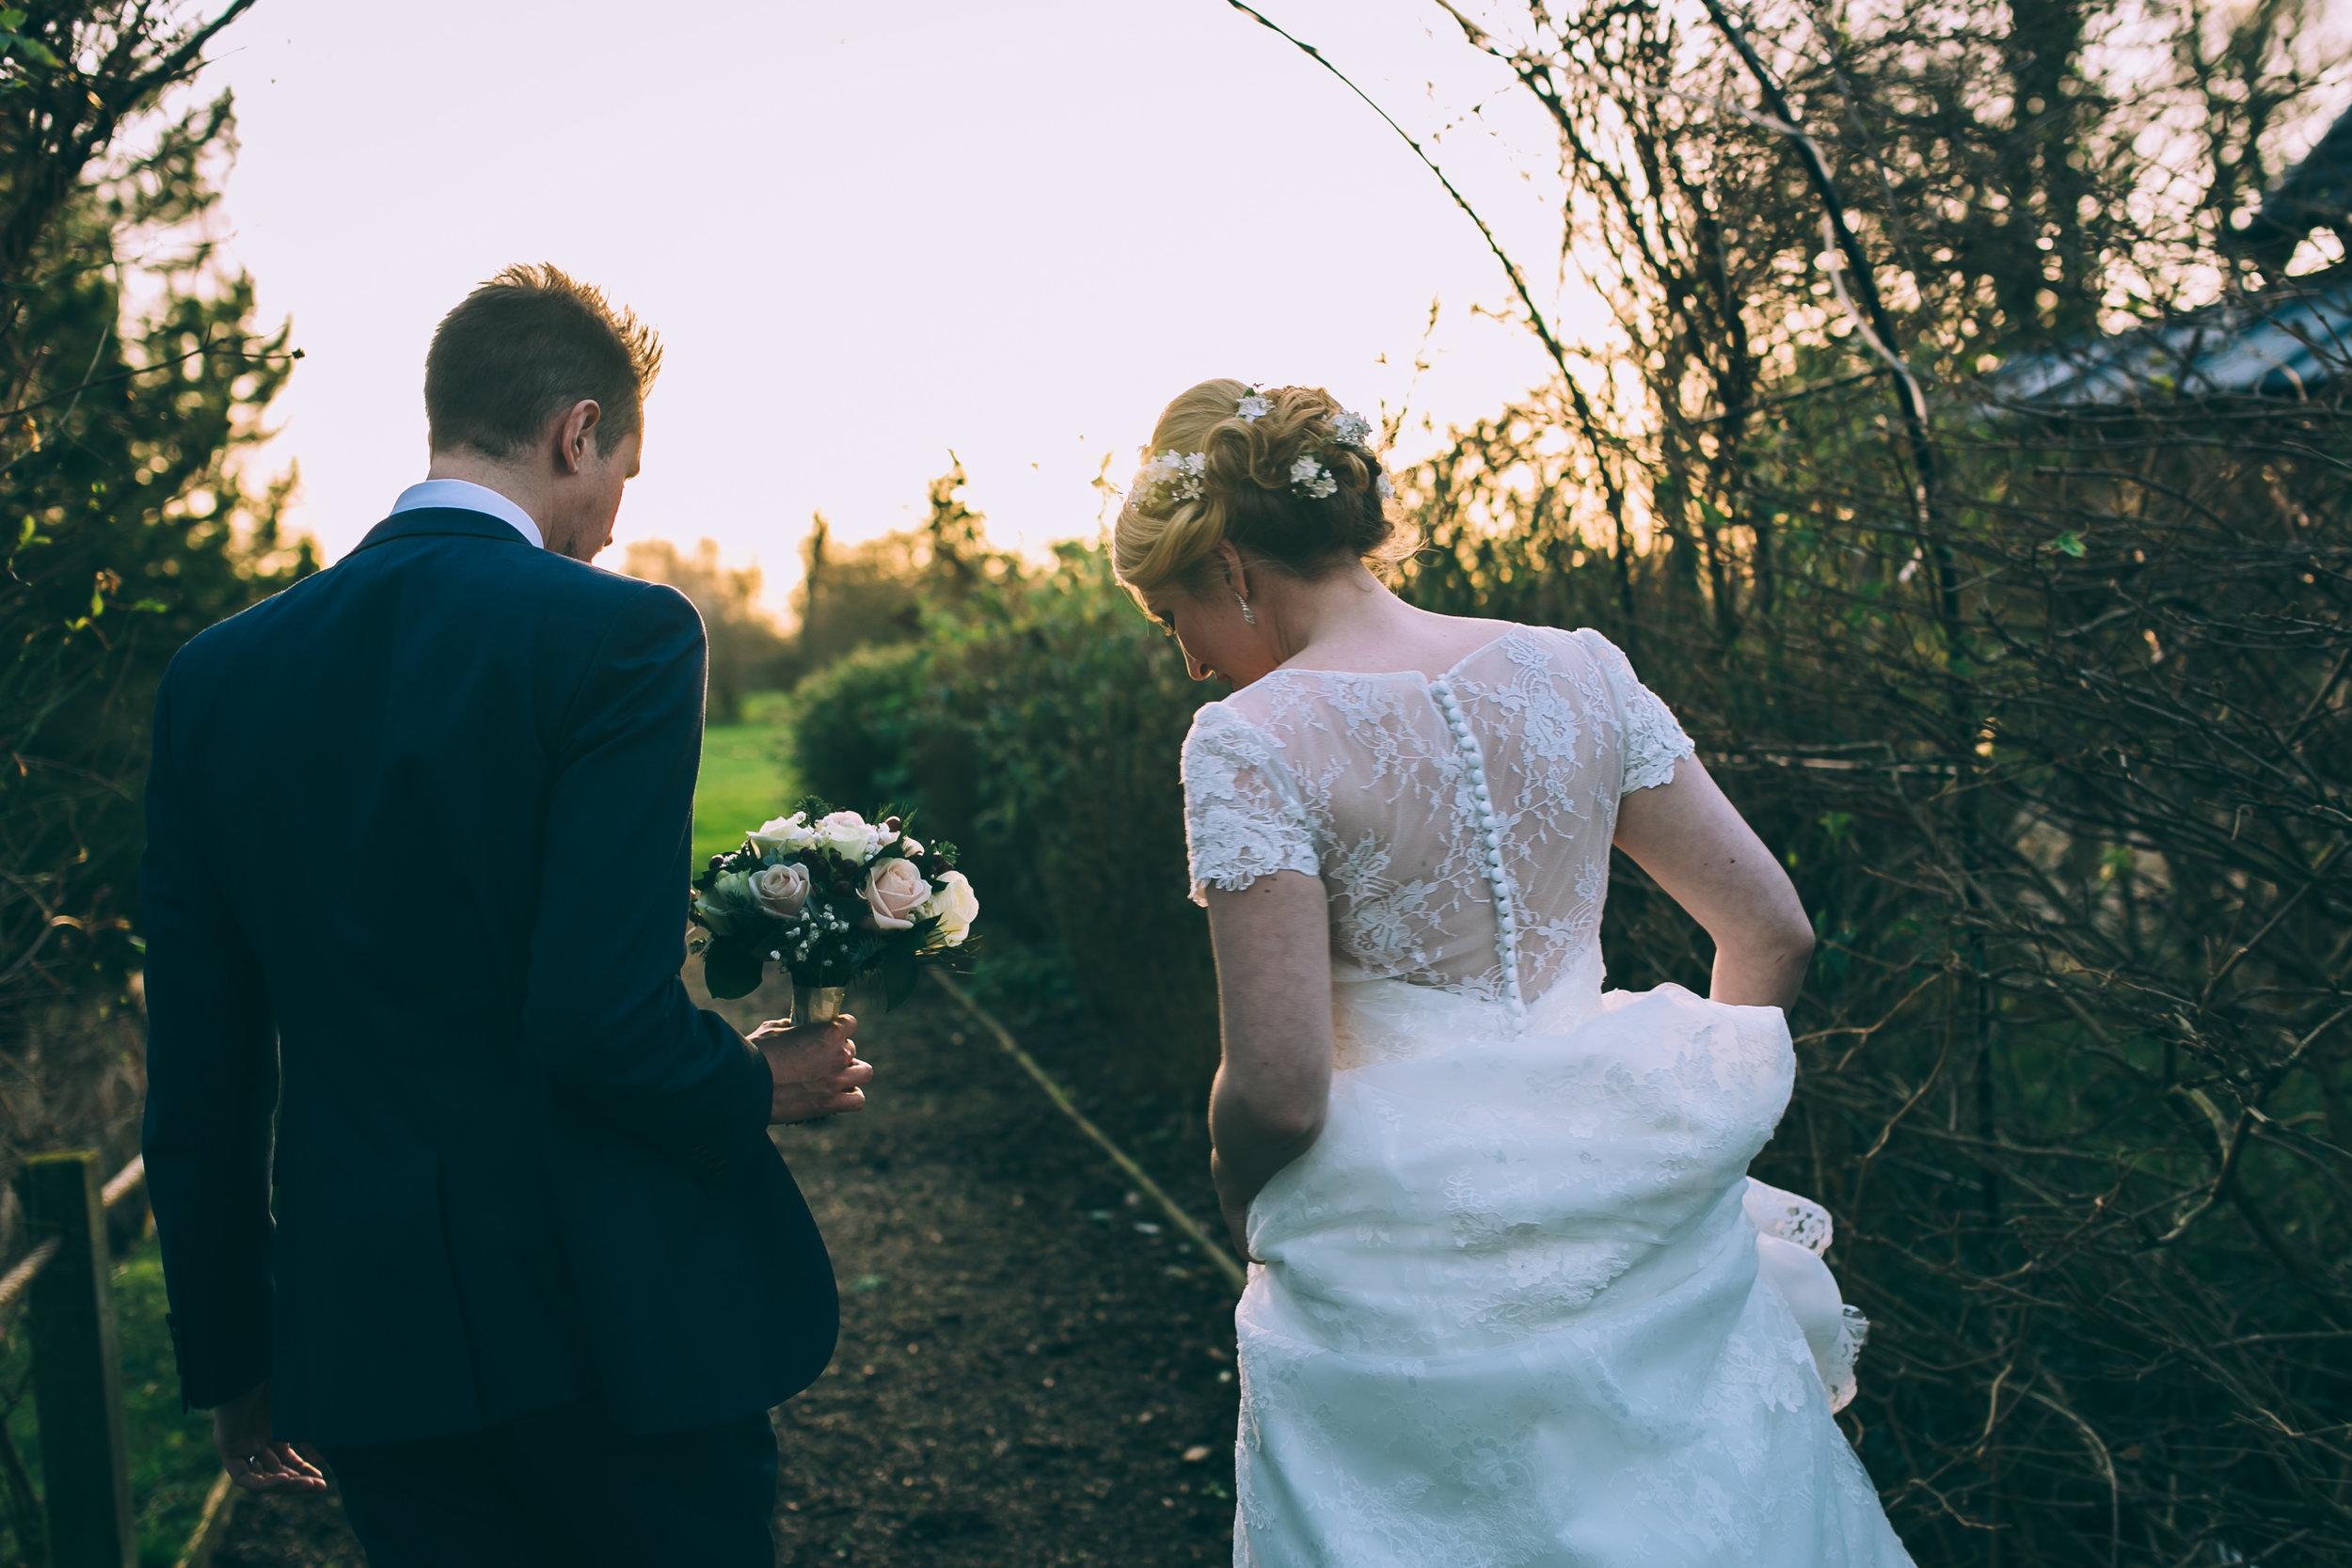 Clare&Iain-Wedding-at-The-Oak-Tree-Over-tom-biddle-photographer-tb241.jpg